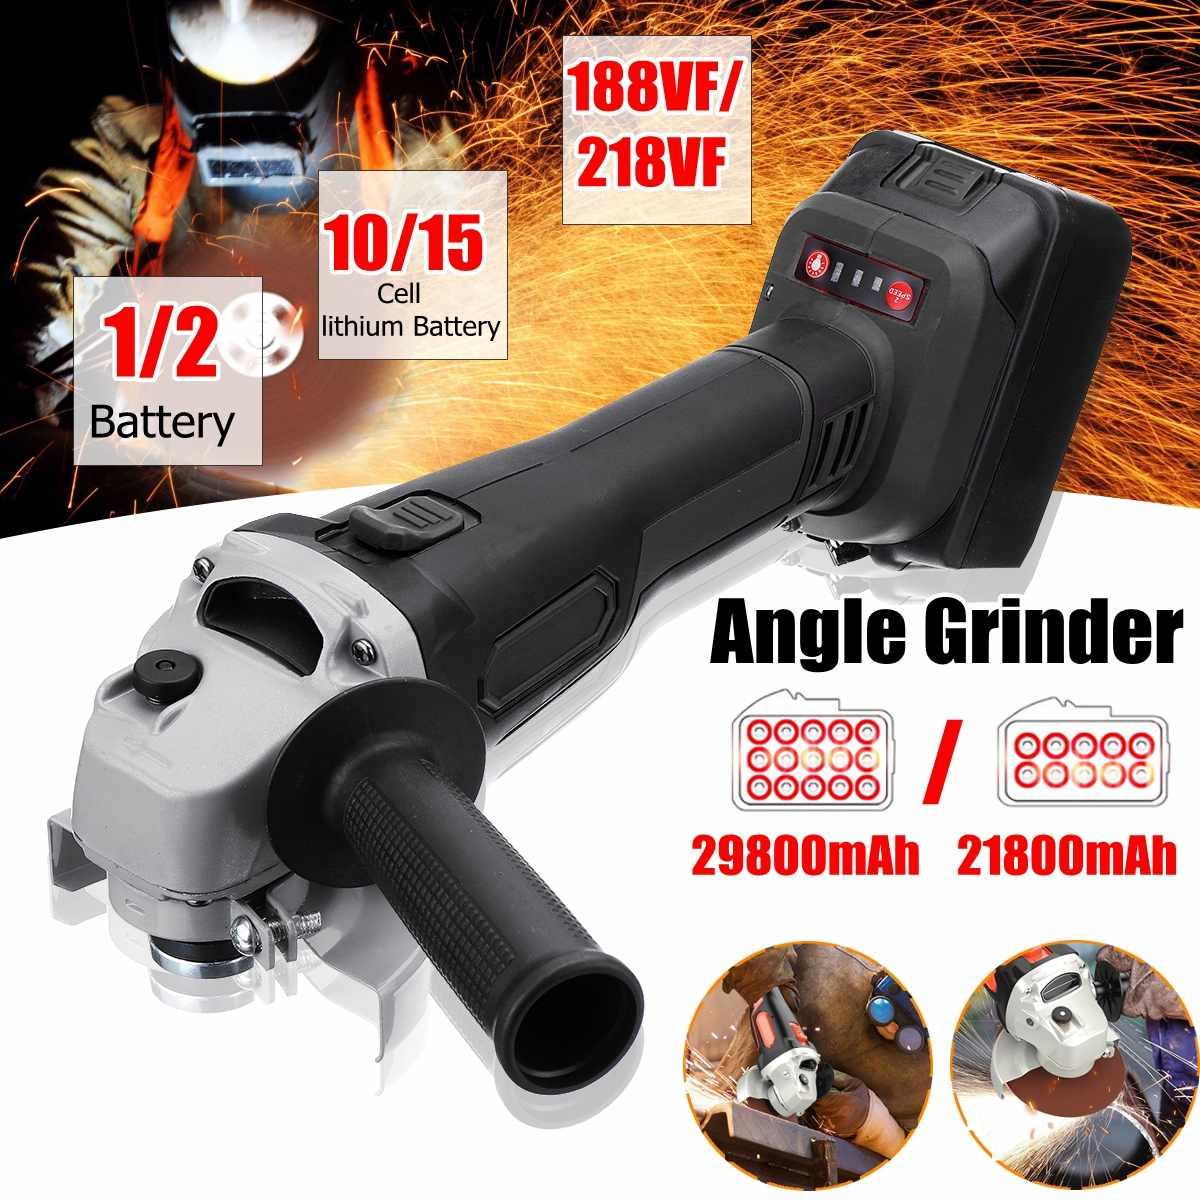 188VF/218VF Electric Angle Grinder Cordless Polisher 21800mah/29800mah Polishing Machine Cutting Tool Set